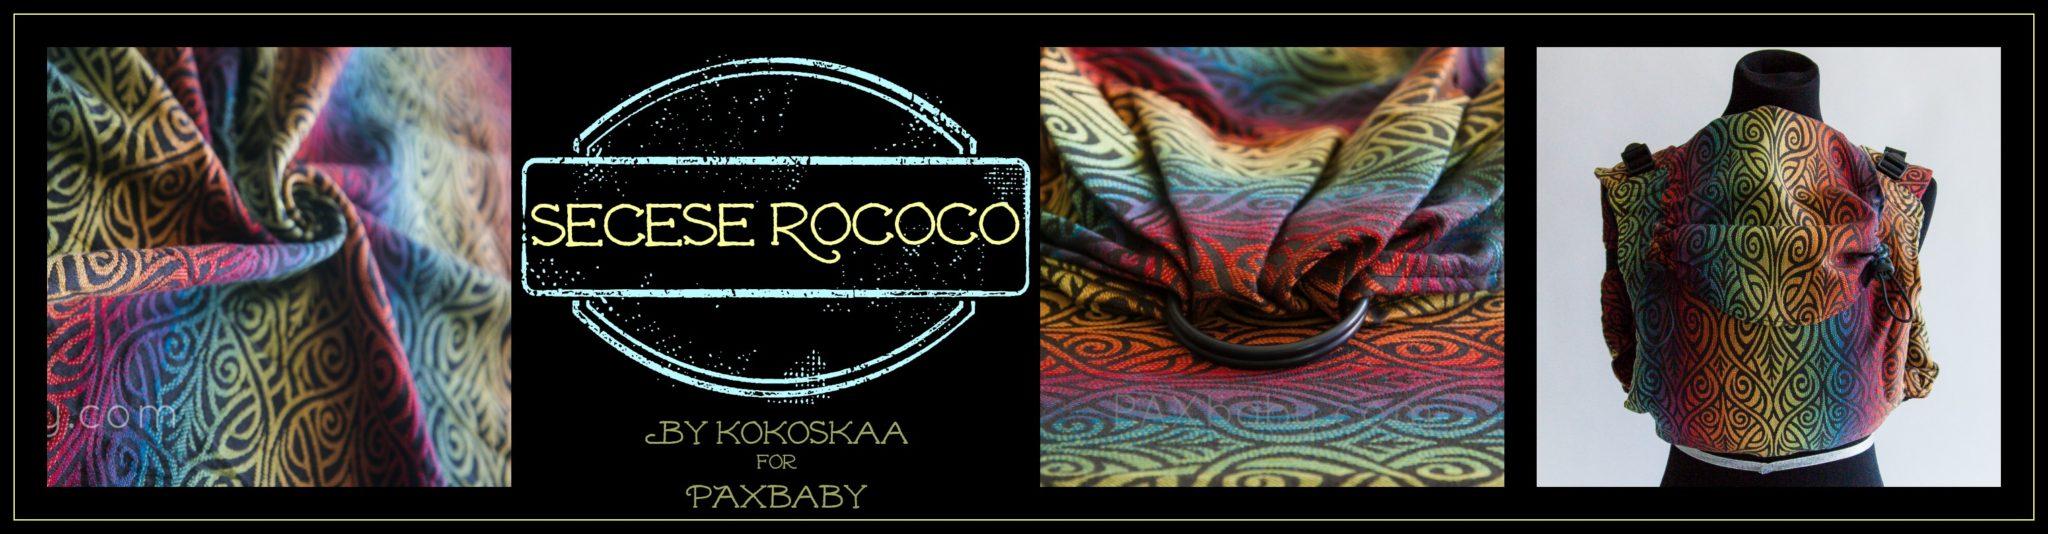 PAXbaby_kokoskaa_secese rococo_woven wrap_babywearing